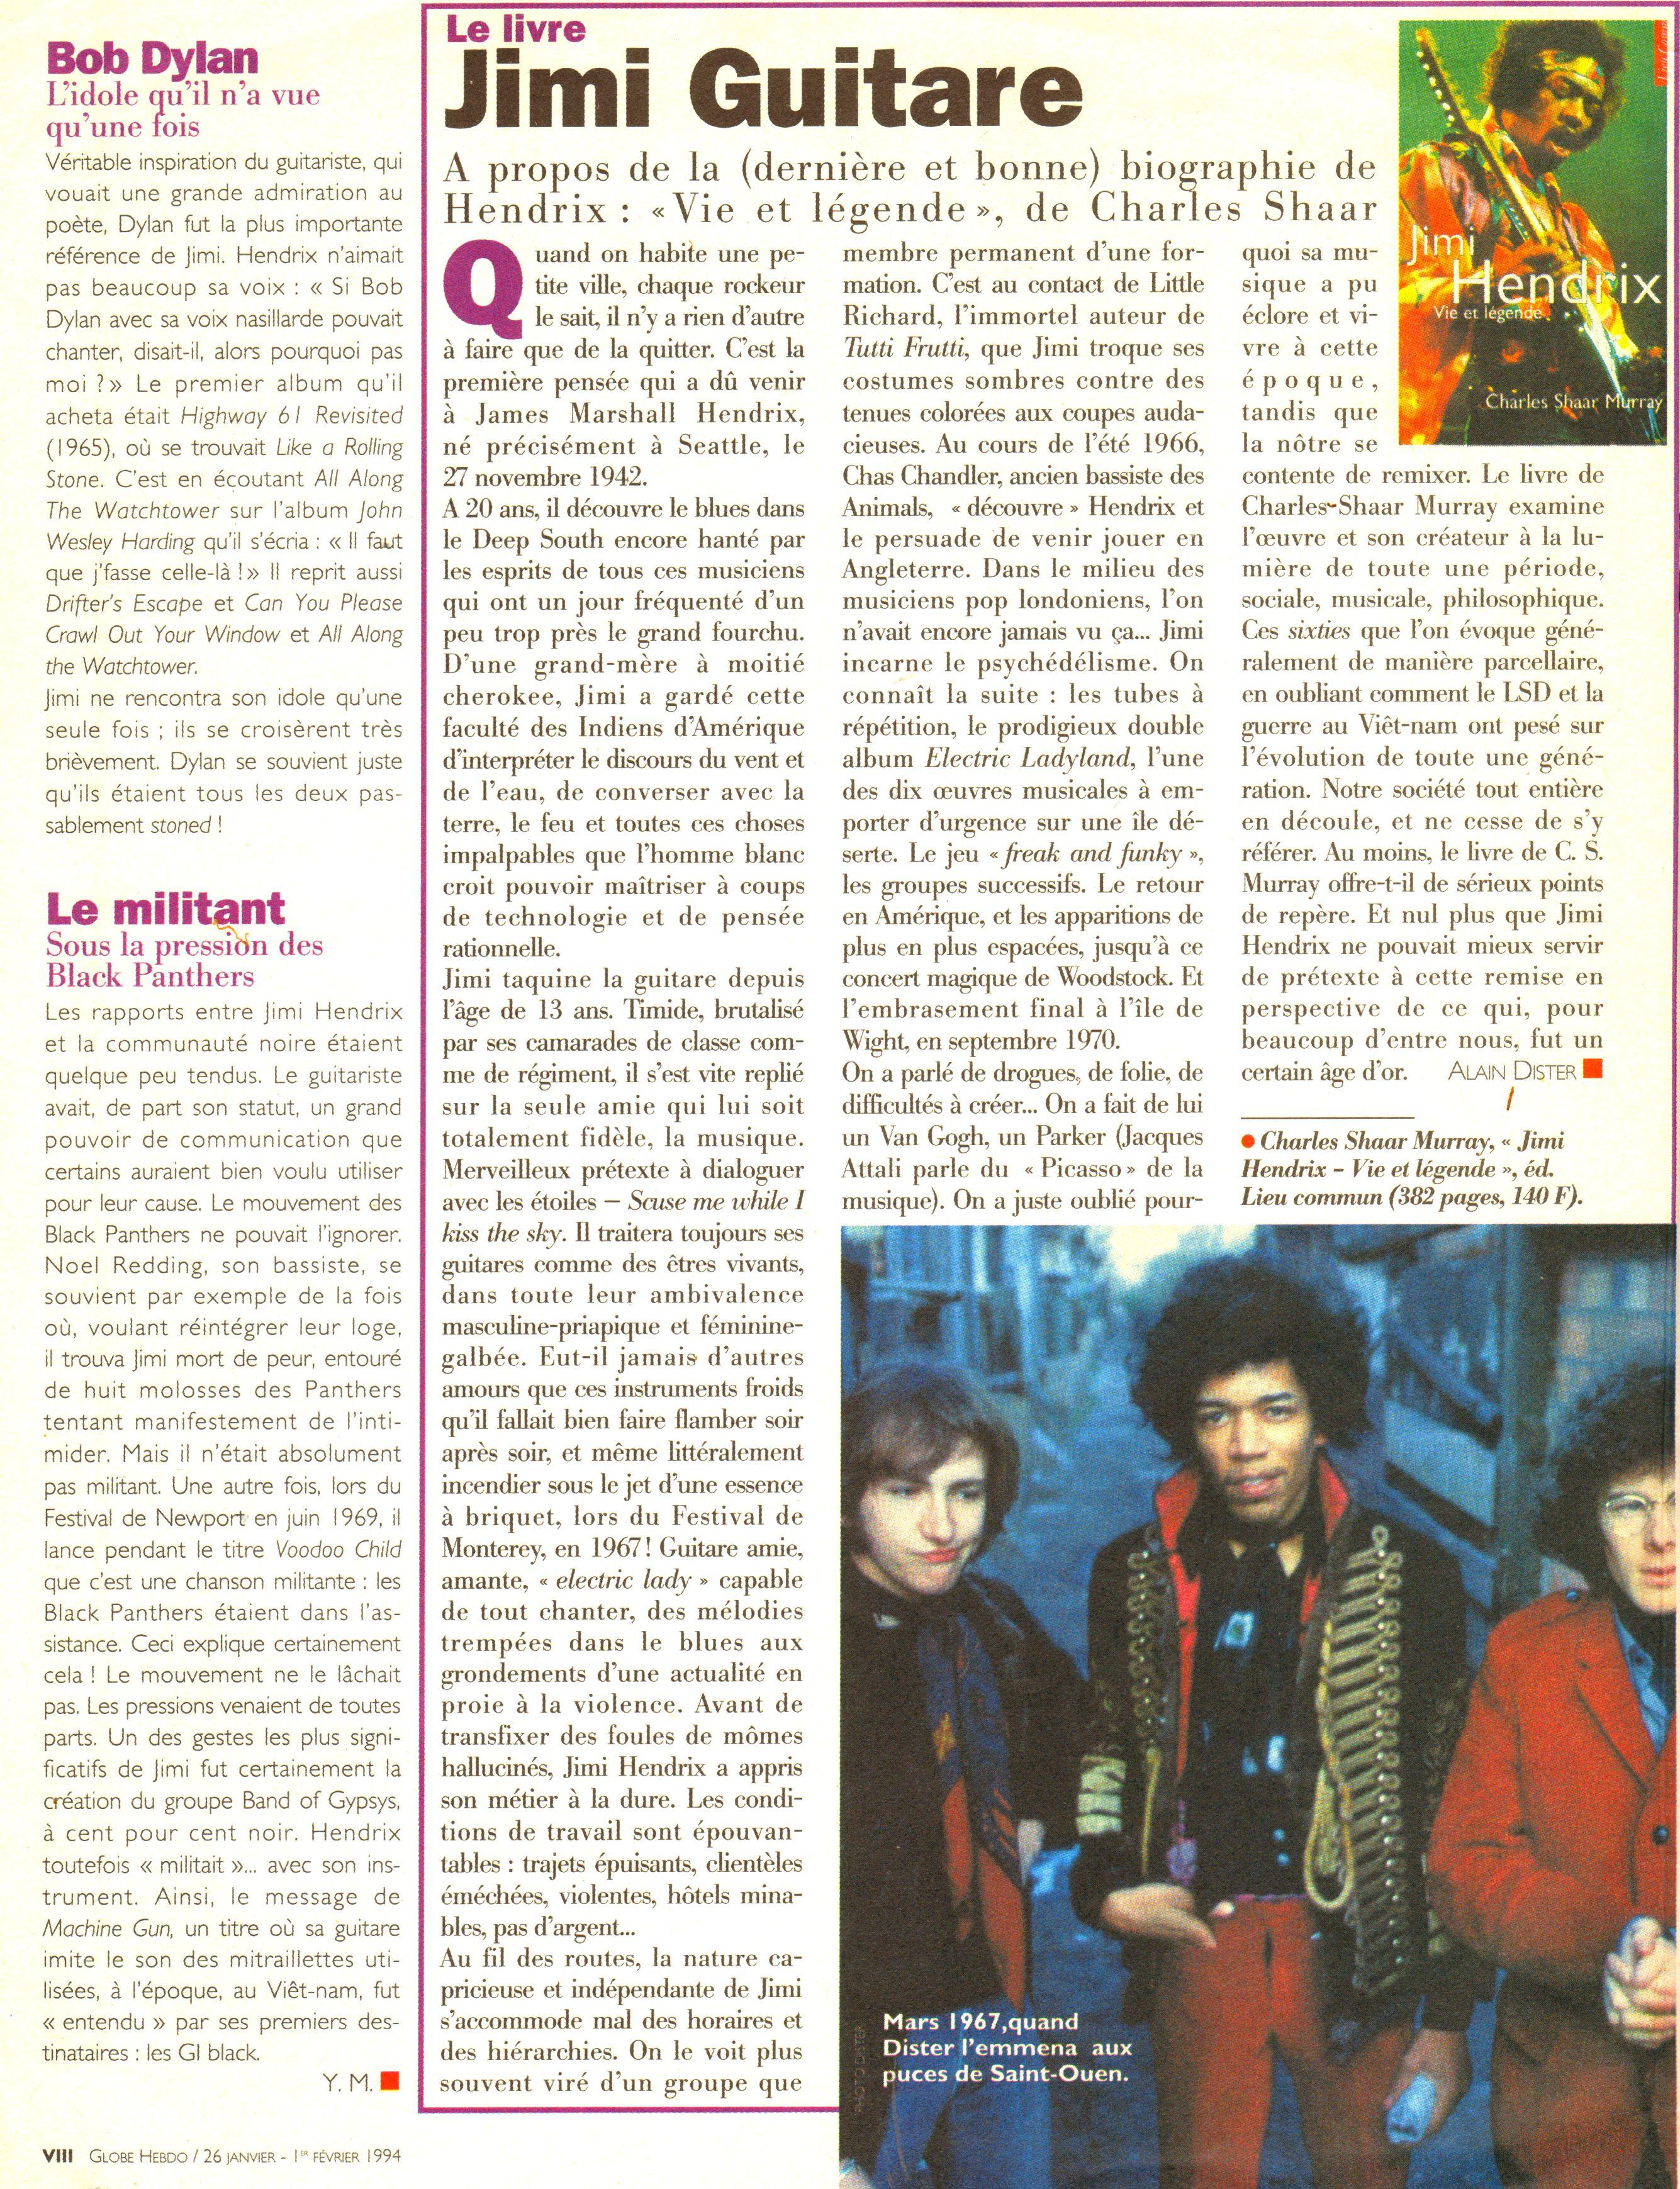 Magazines Français 1989 - 2014 GlobeHebdo26Janvier1reFevrier1994Page08